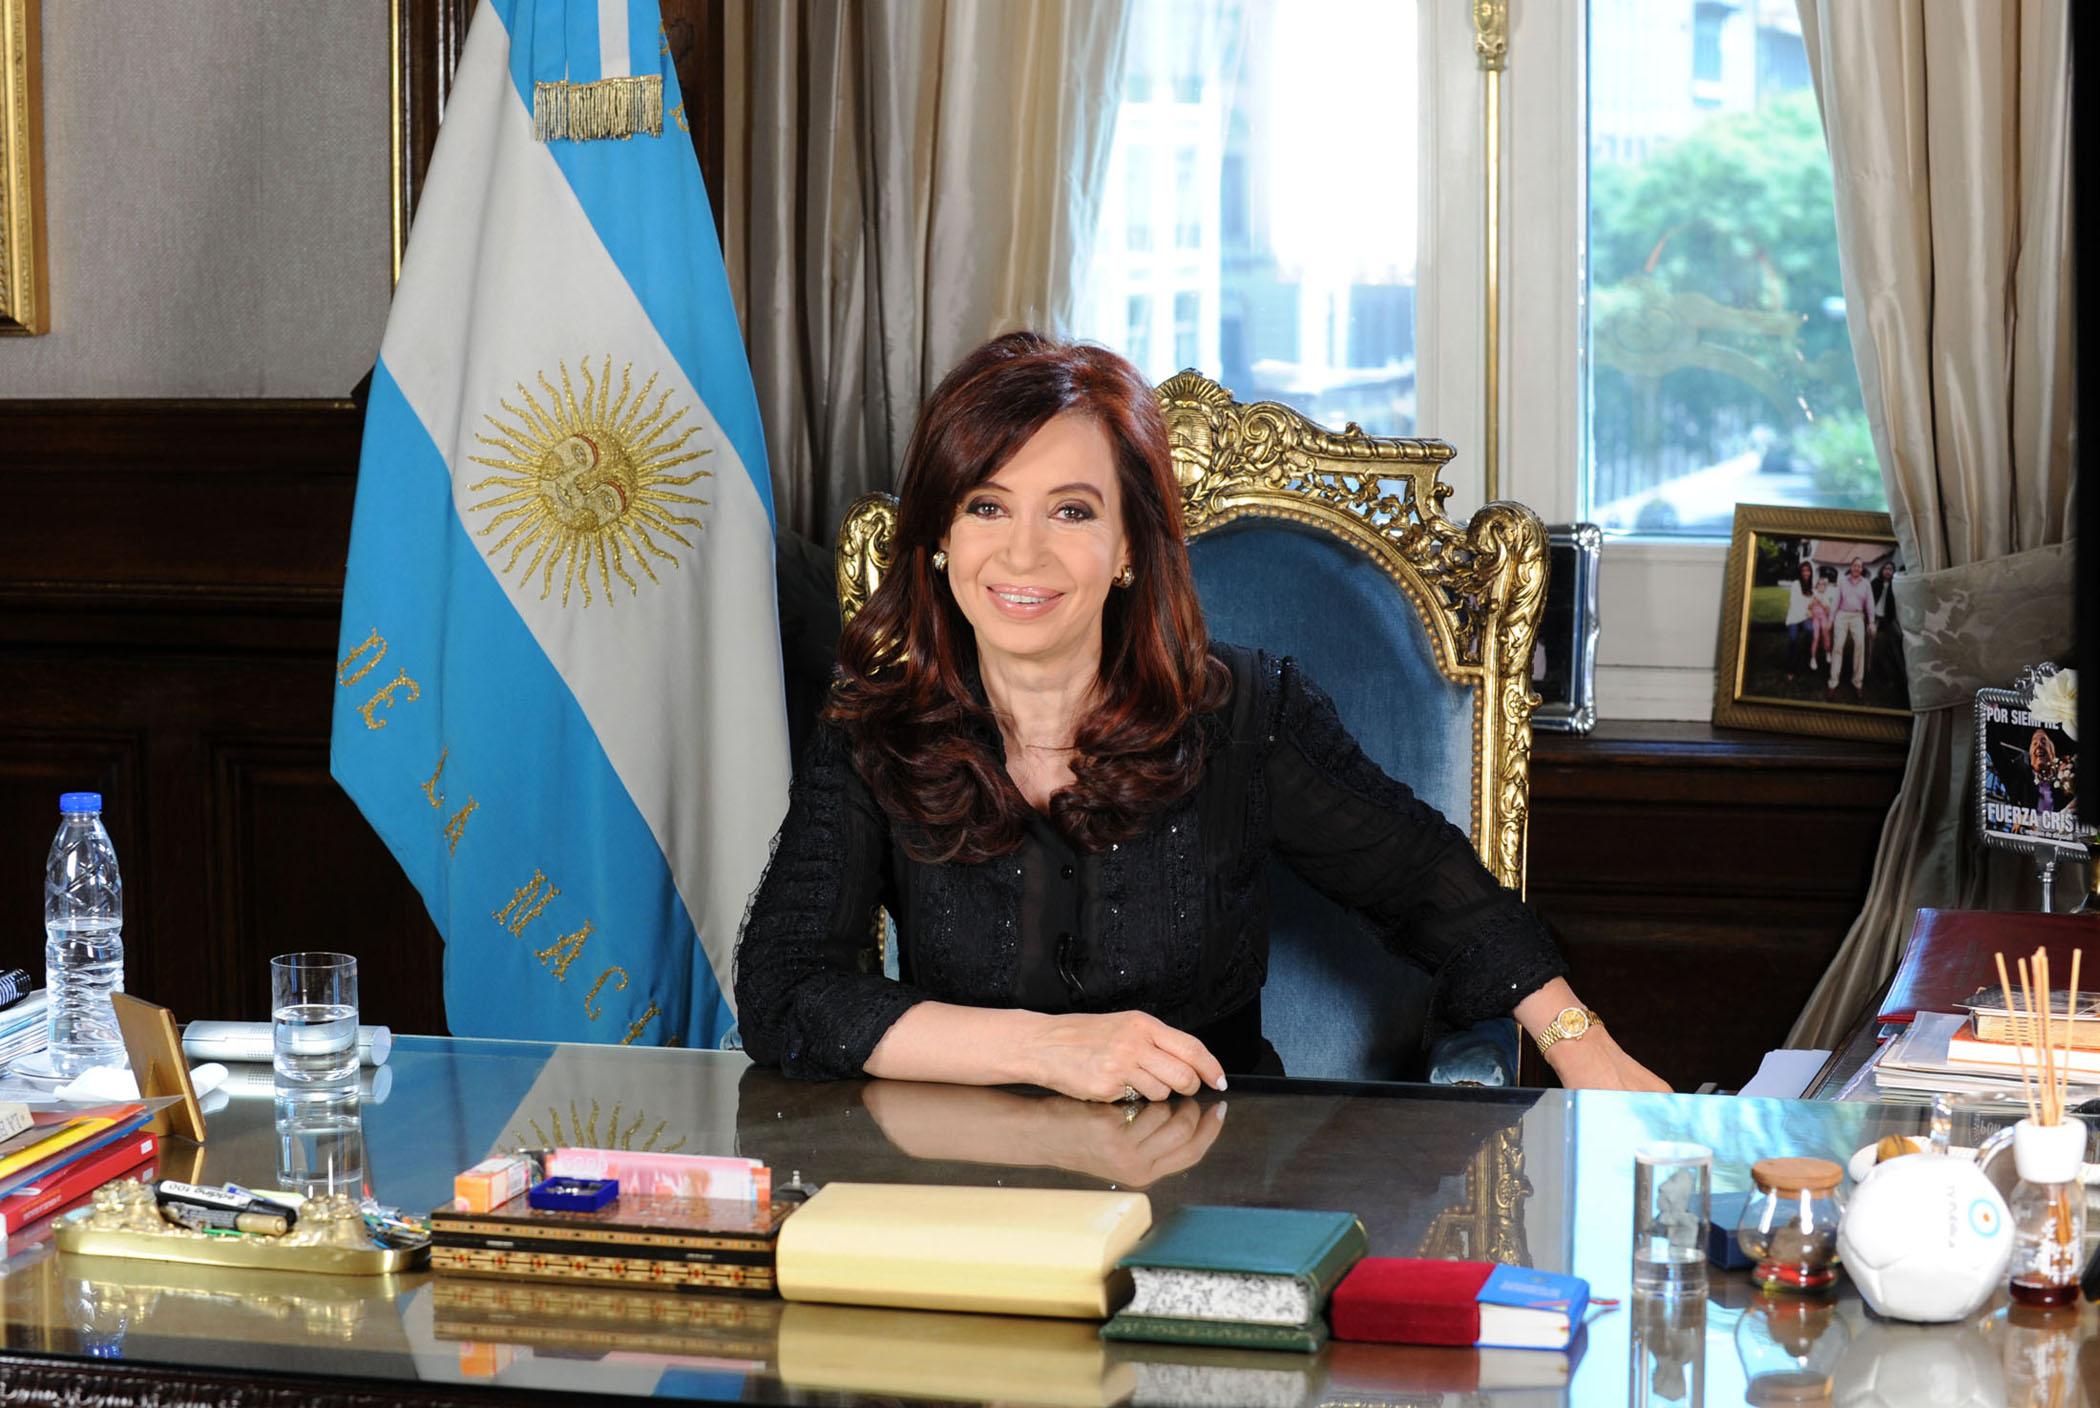 Mensaje_de_fin_de_año_de_la_Presidenta